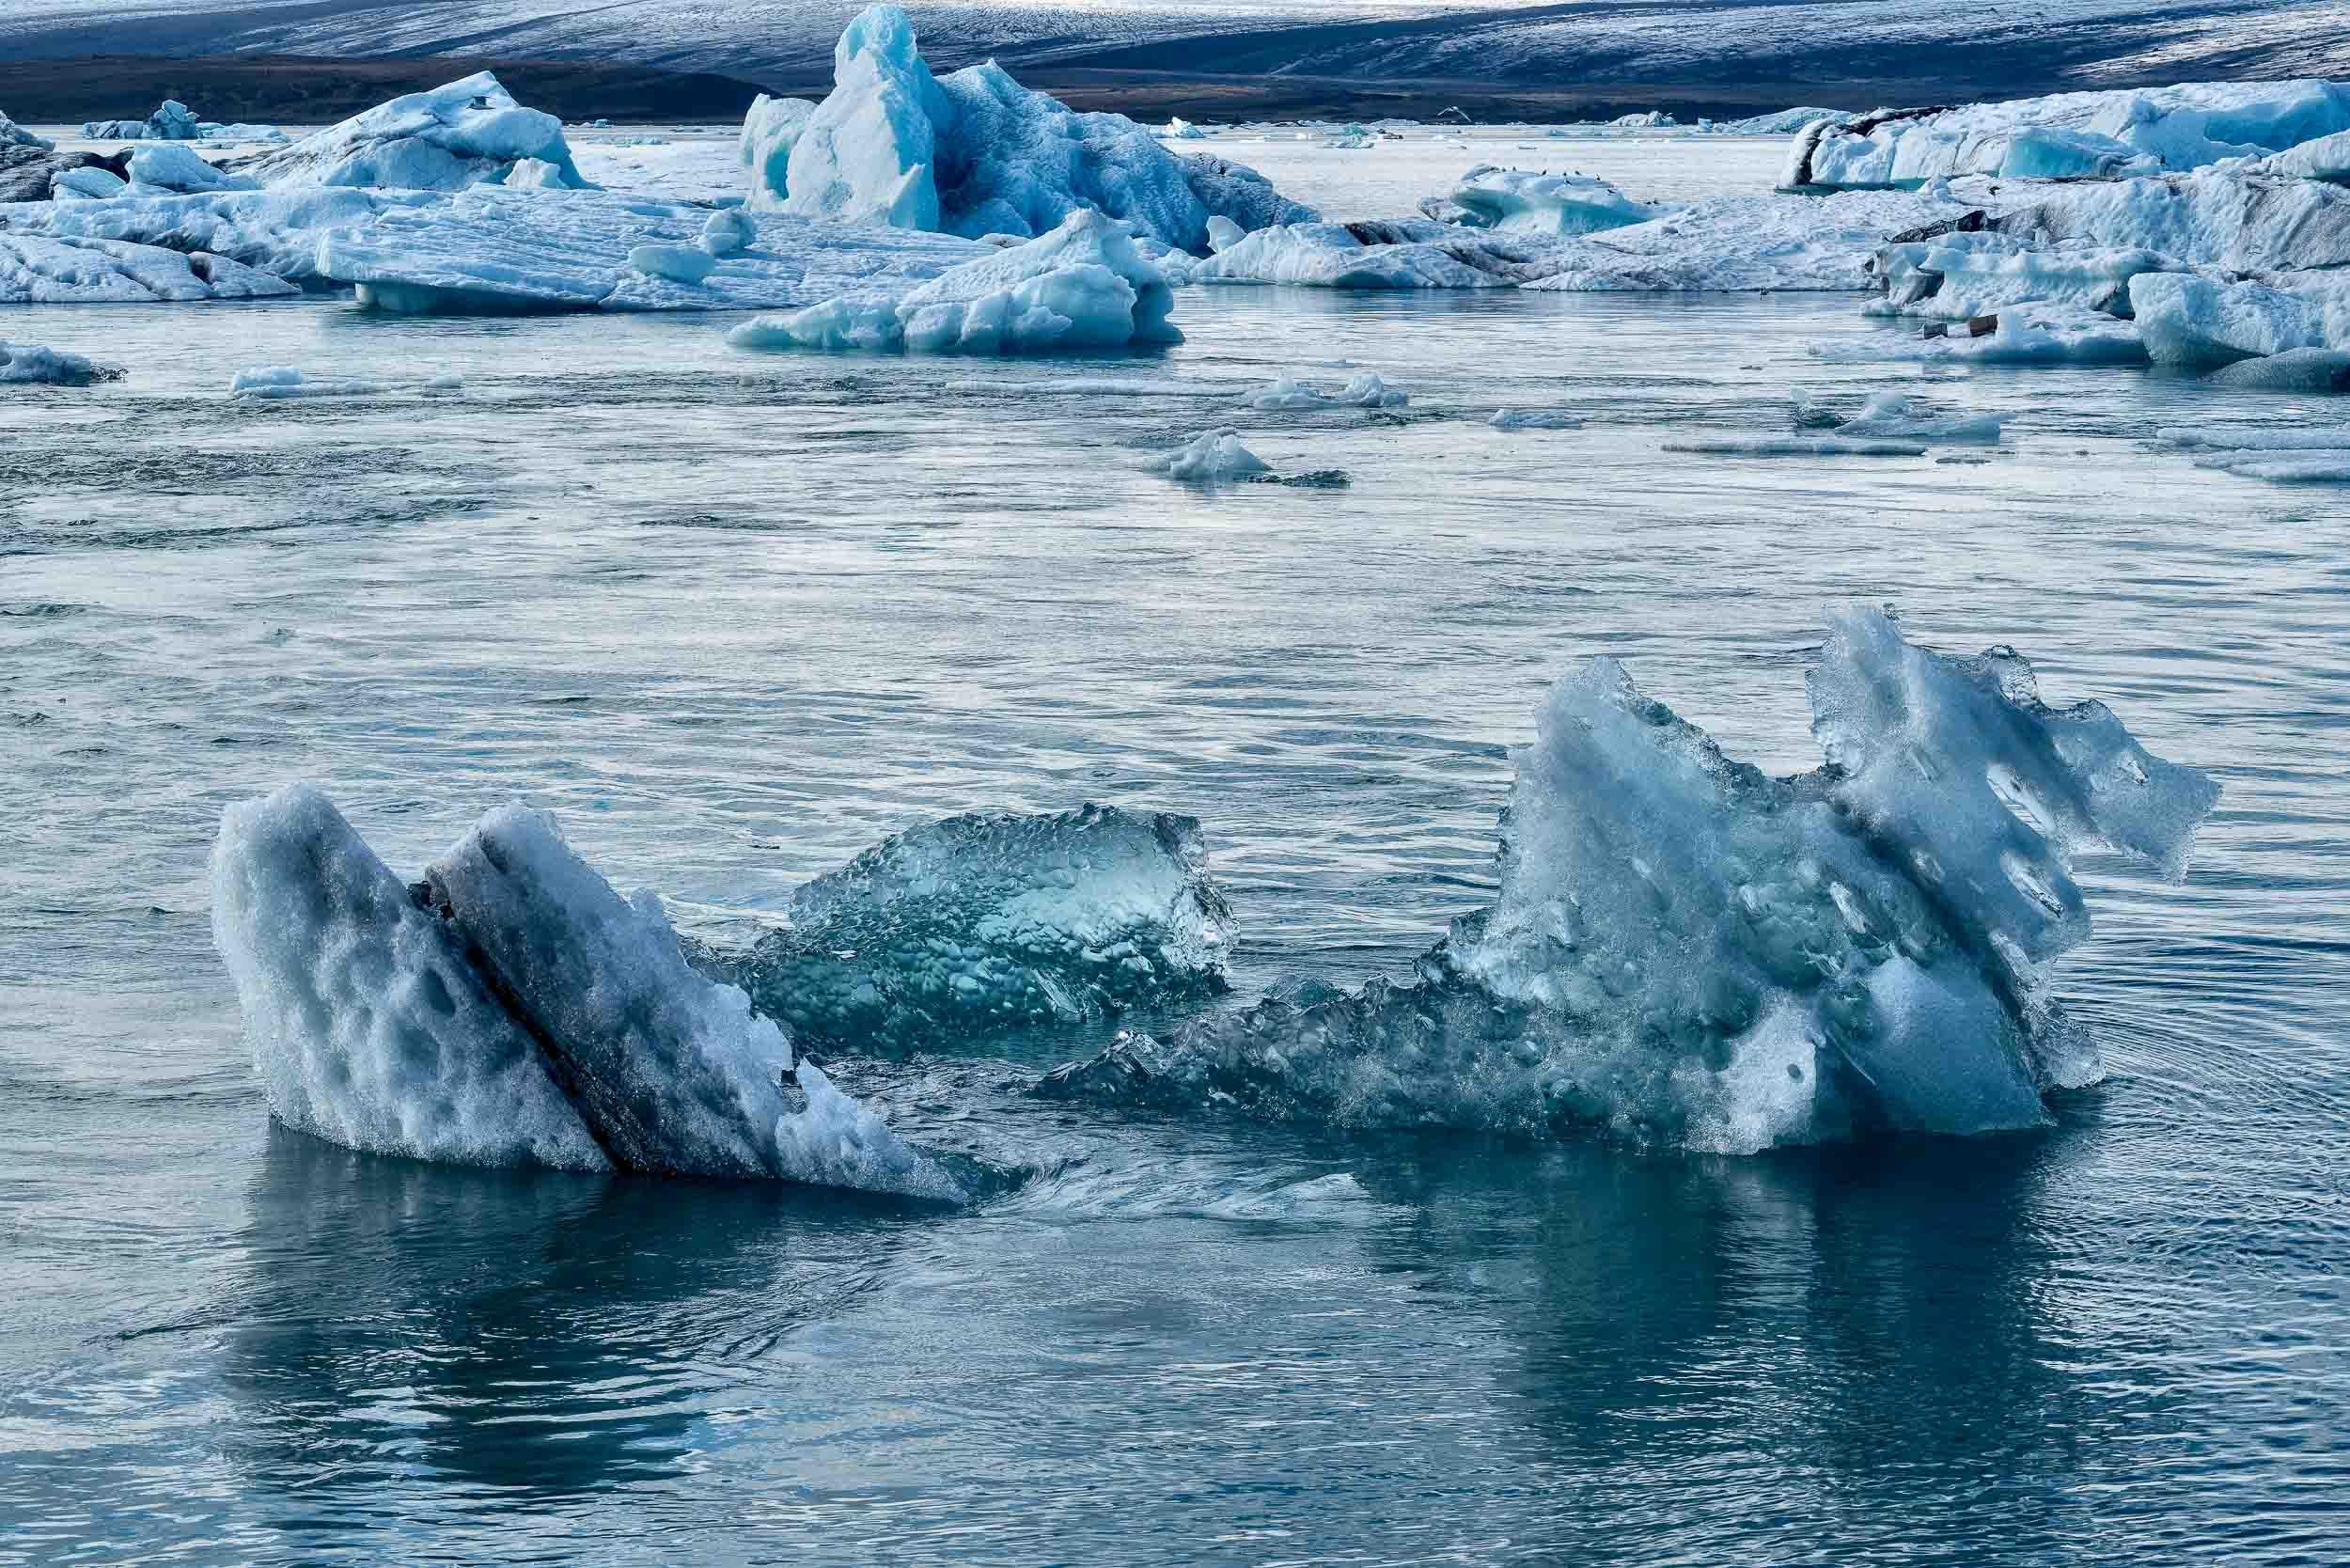 Cold, blue light illuminating    icebergs    at the    Jökulsárlón Glacier Lagoon    in    Iceland   .